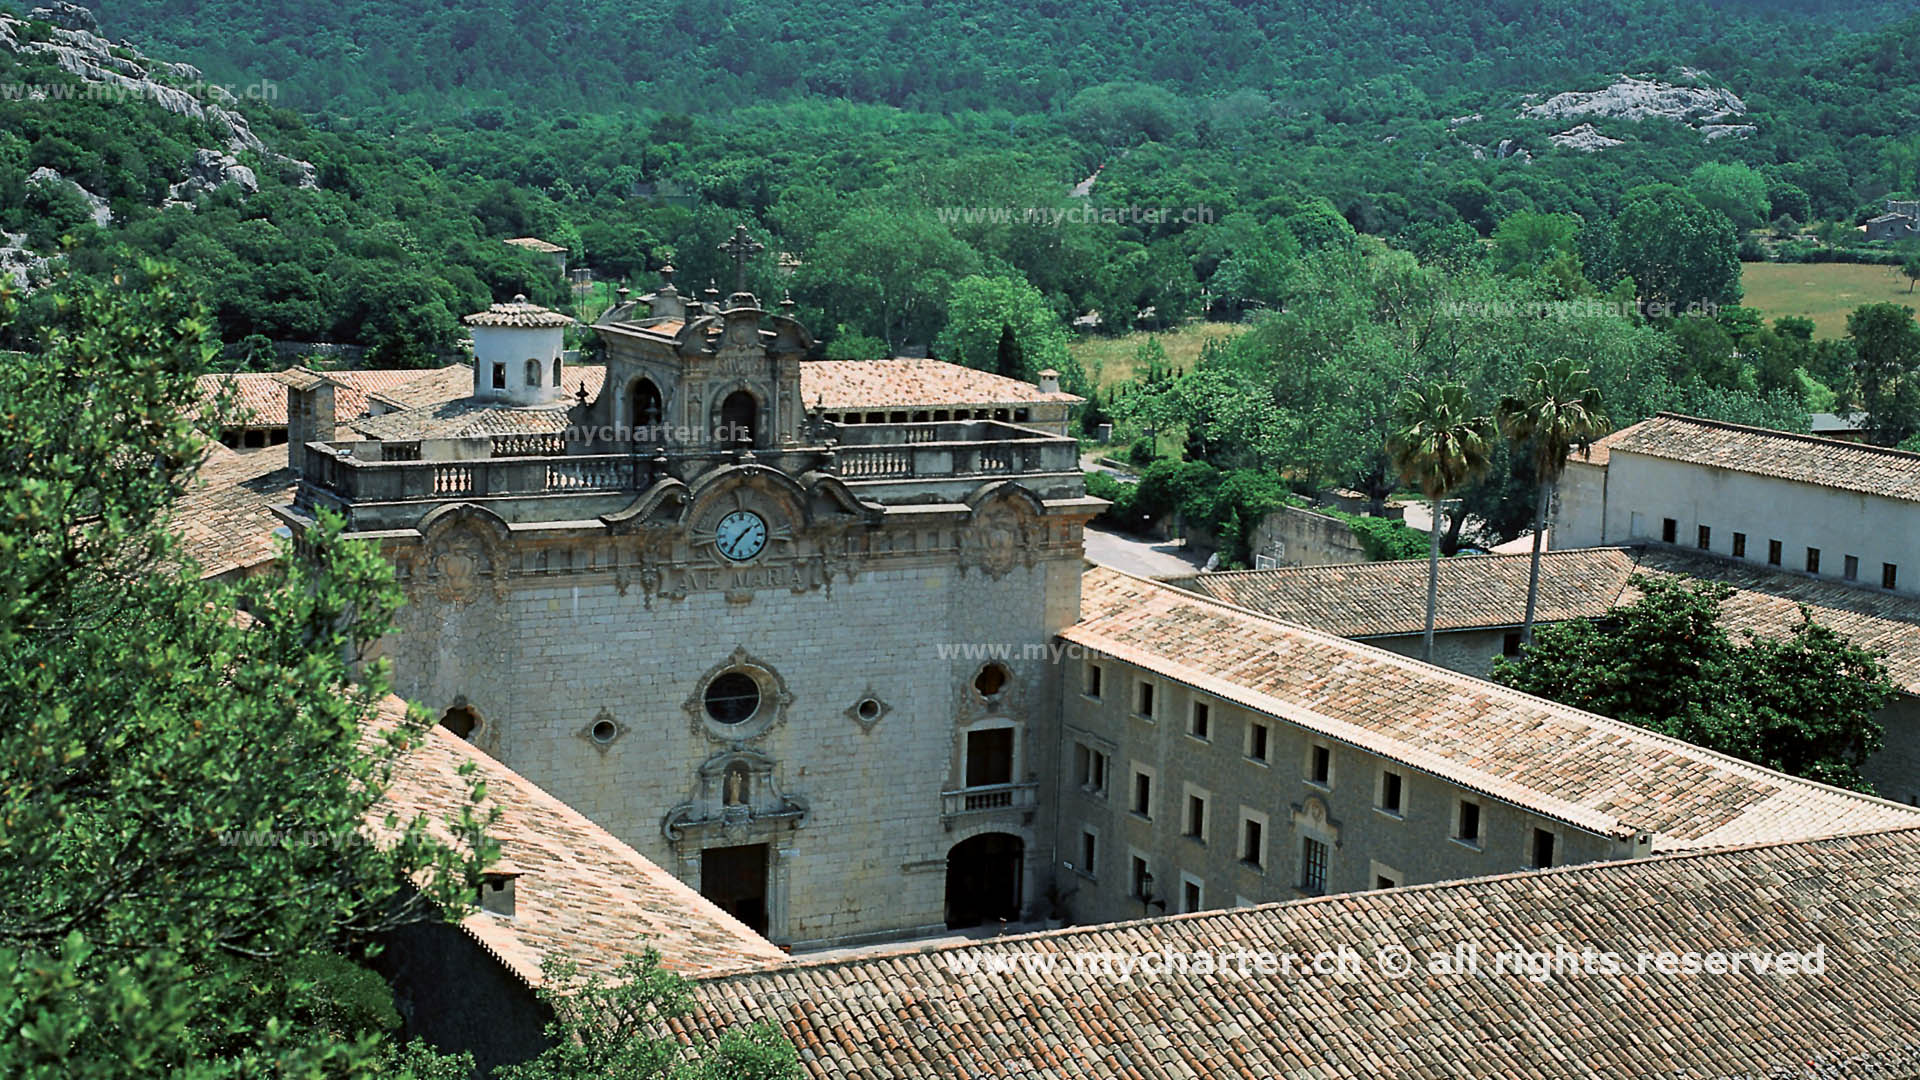 Mallorca - Monasterio Lluc y Sierra Tramuntana